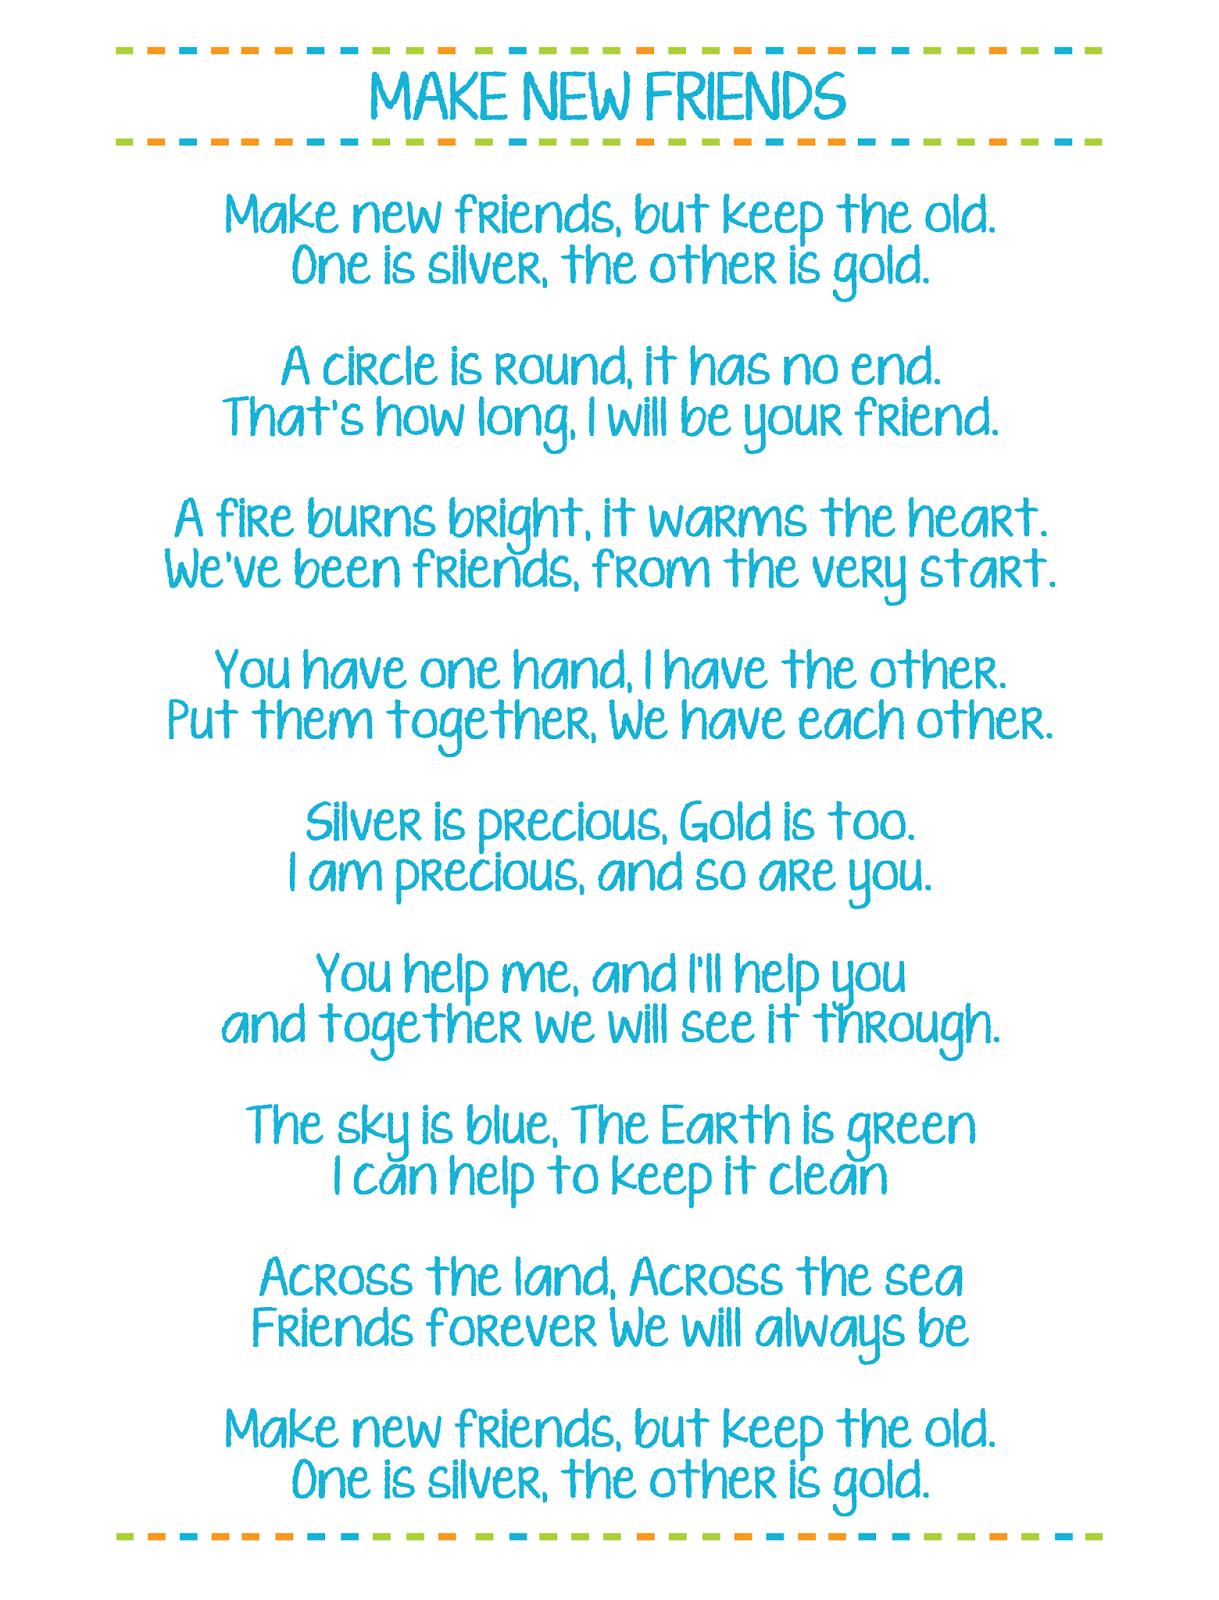 Make New Friends Printable Girl Scout Song Lyrics - Free Printable Song Lyrics